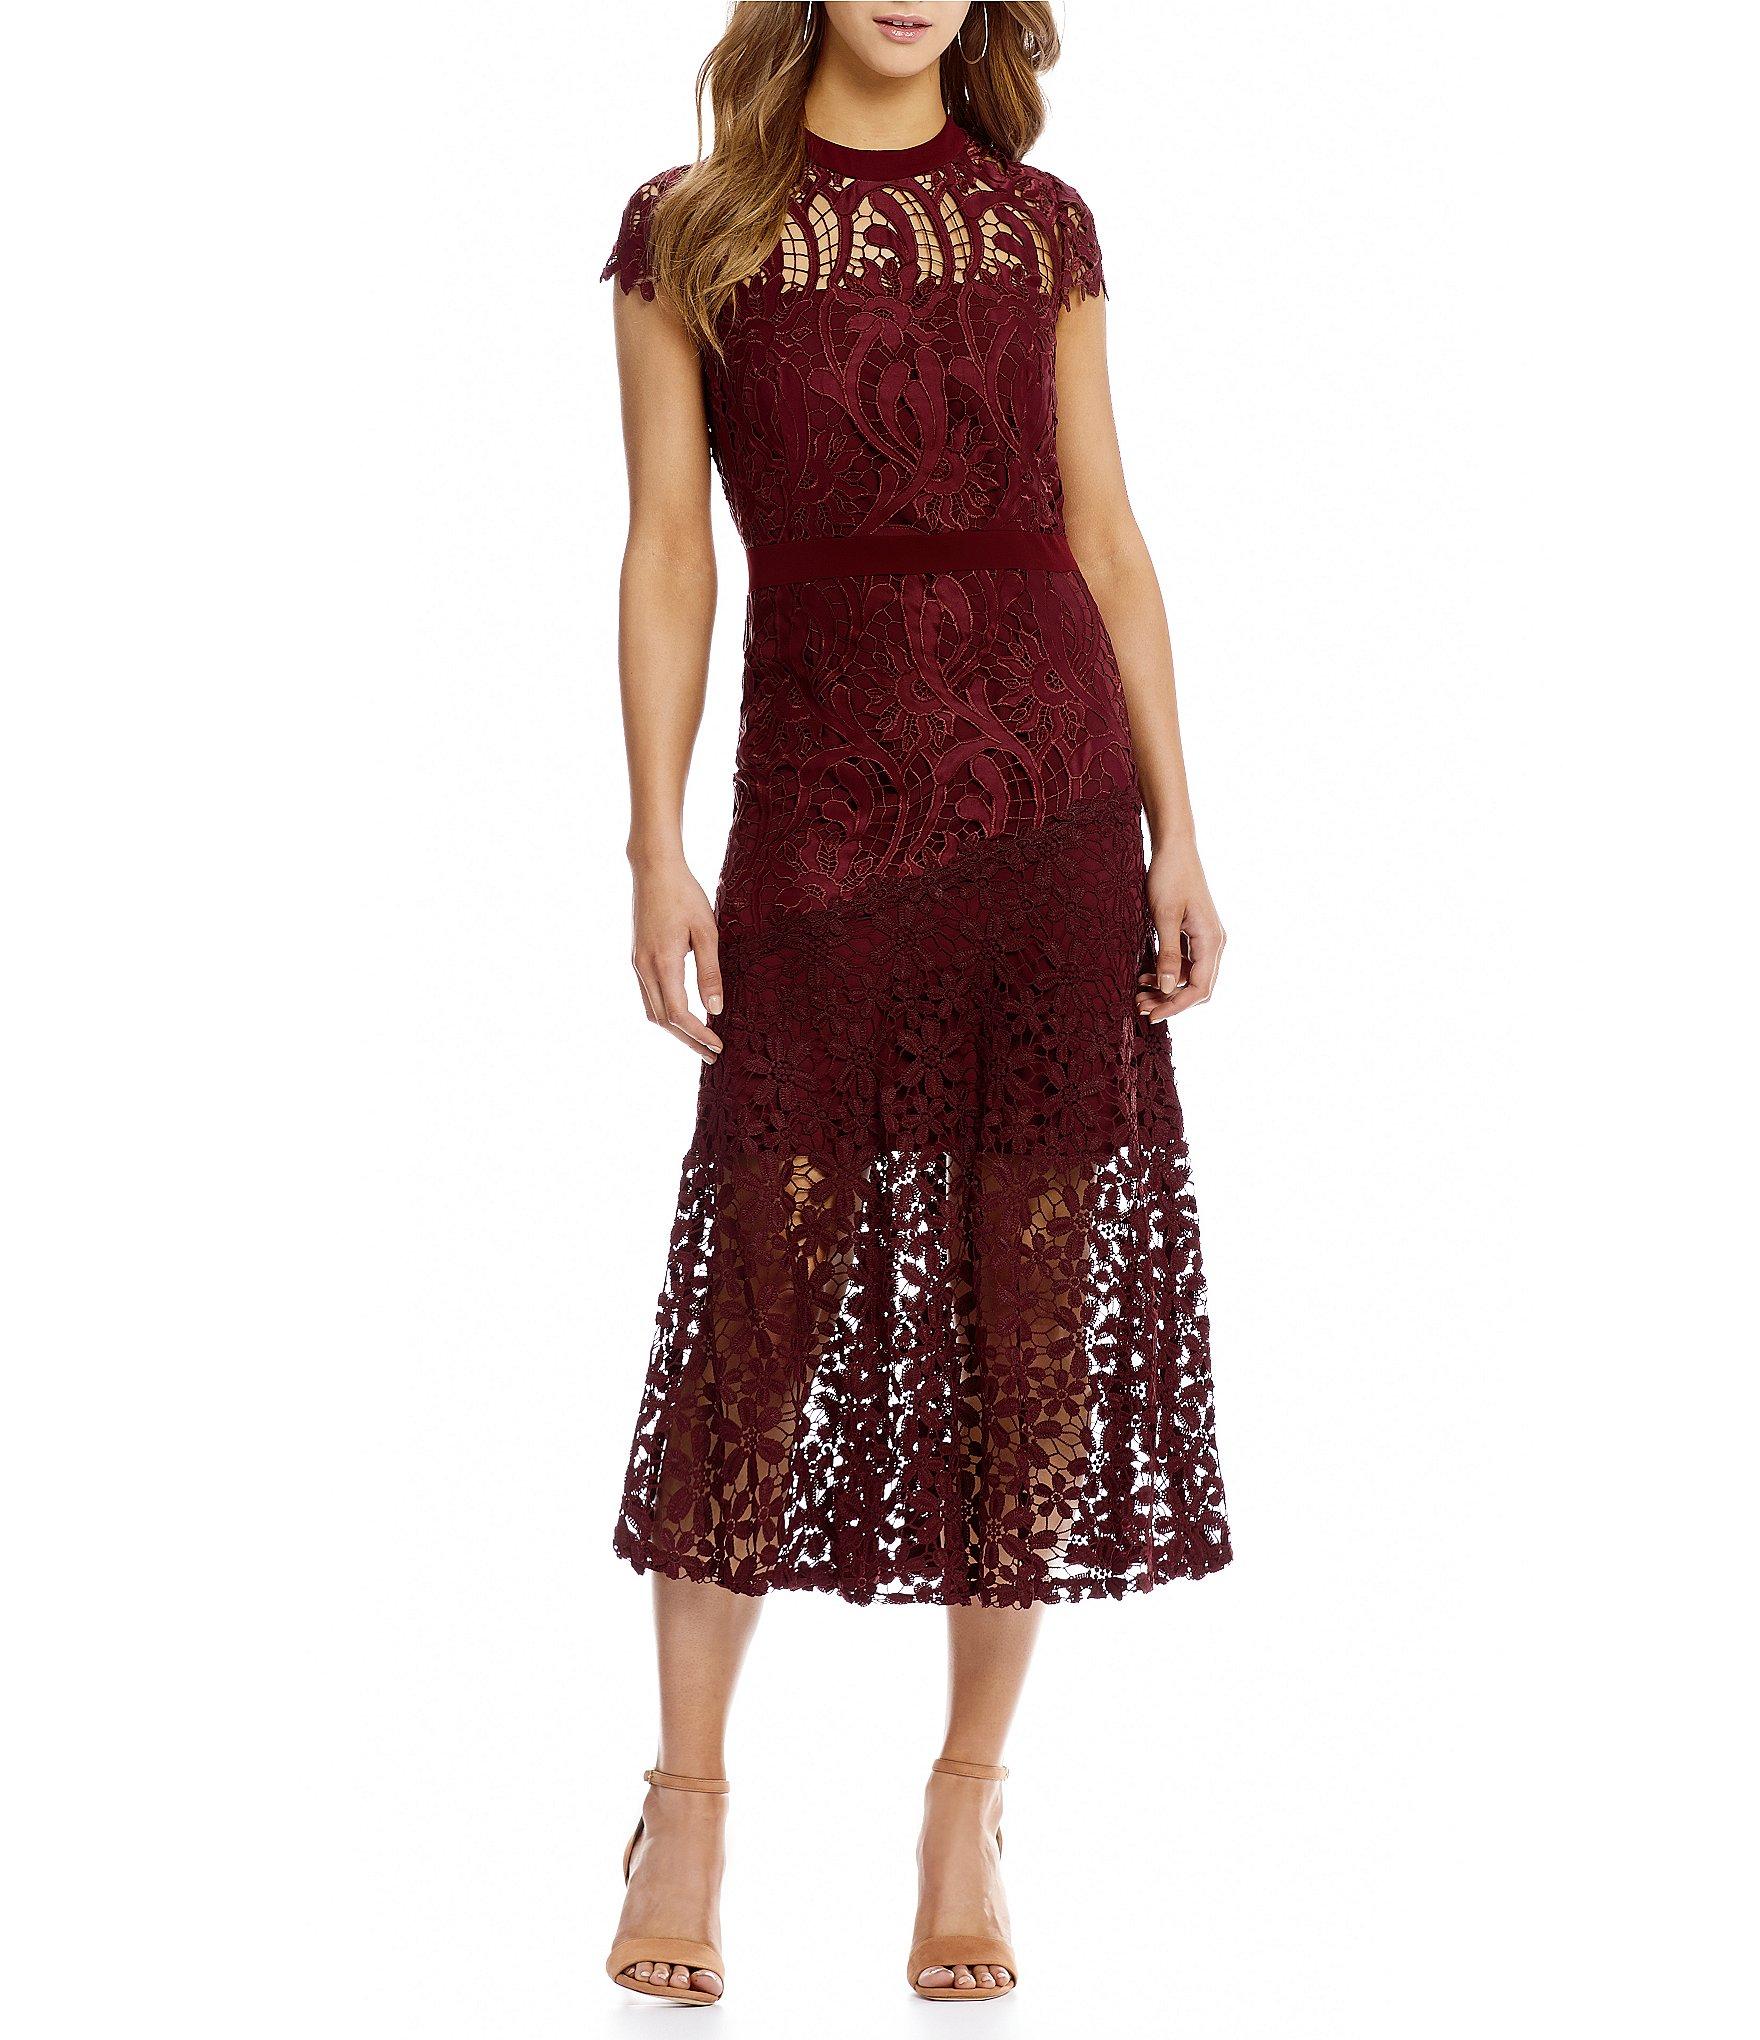 4816a7a6f8d Antonio Melani Macie Lace Dress